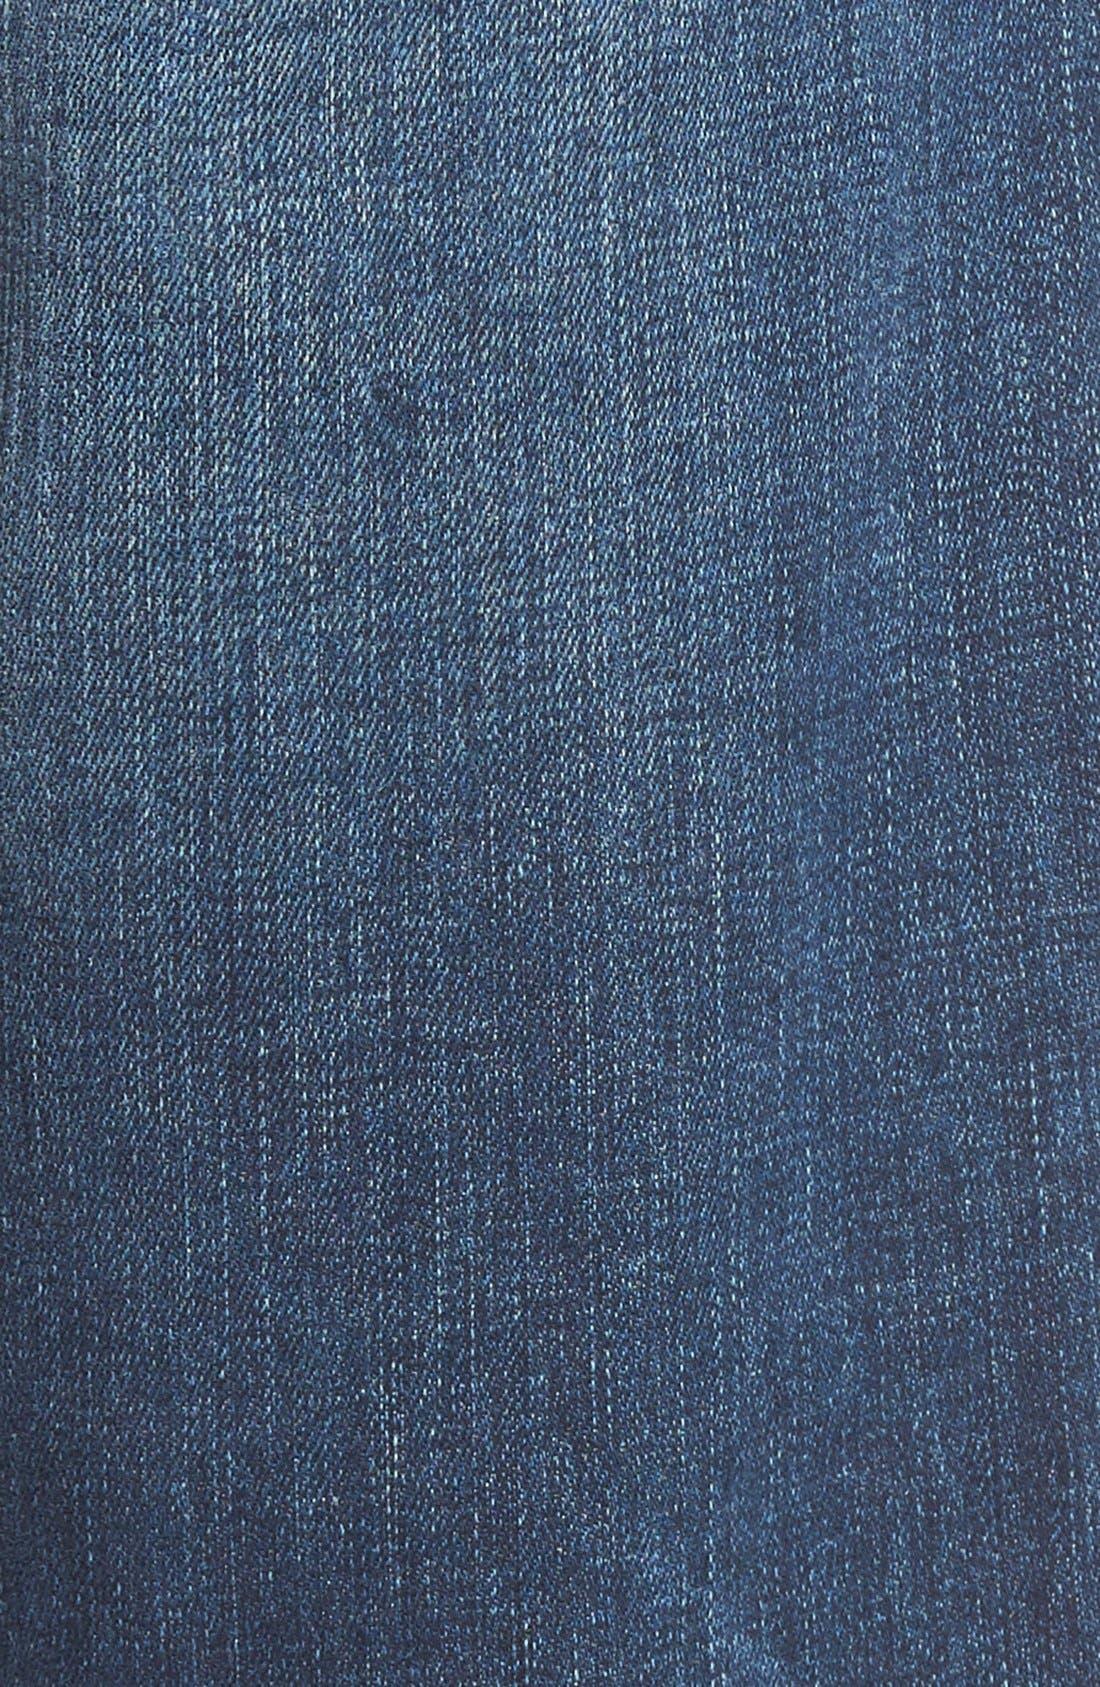 Brixton Slim Fit Jeans,                             Alternate thumbnail 5, color,                             Gladwin